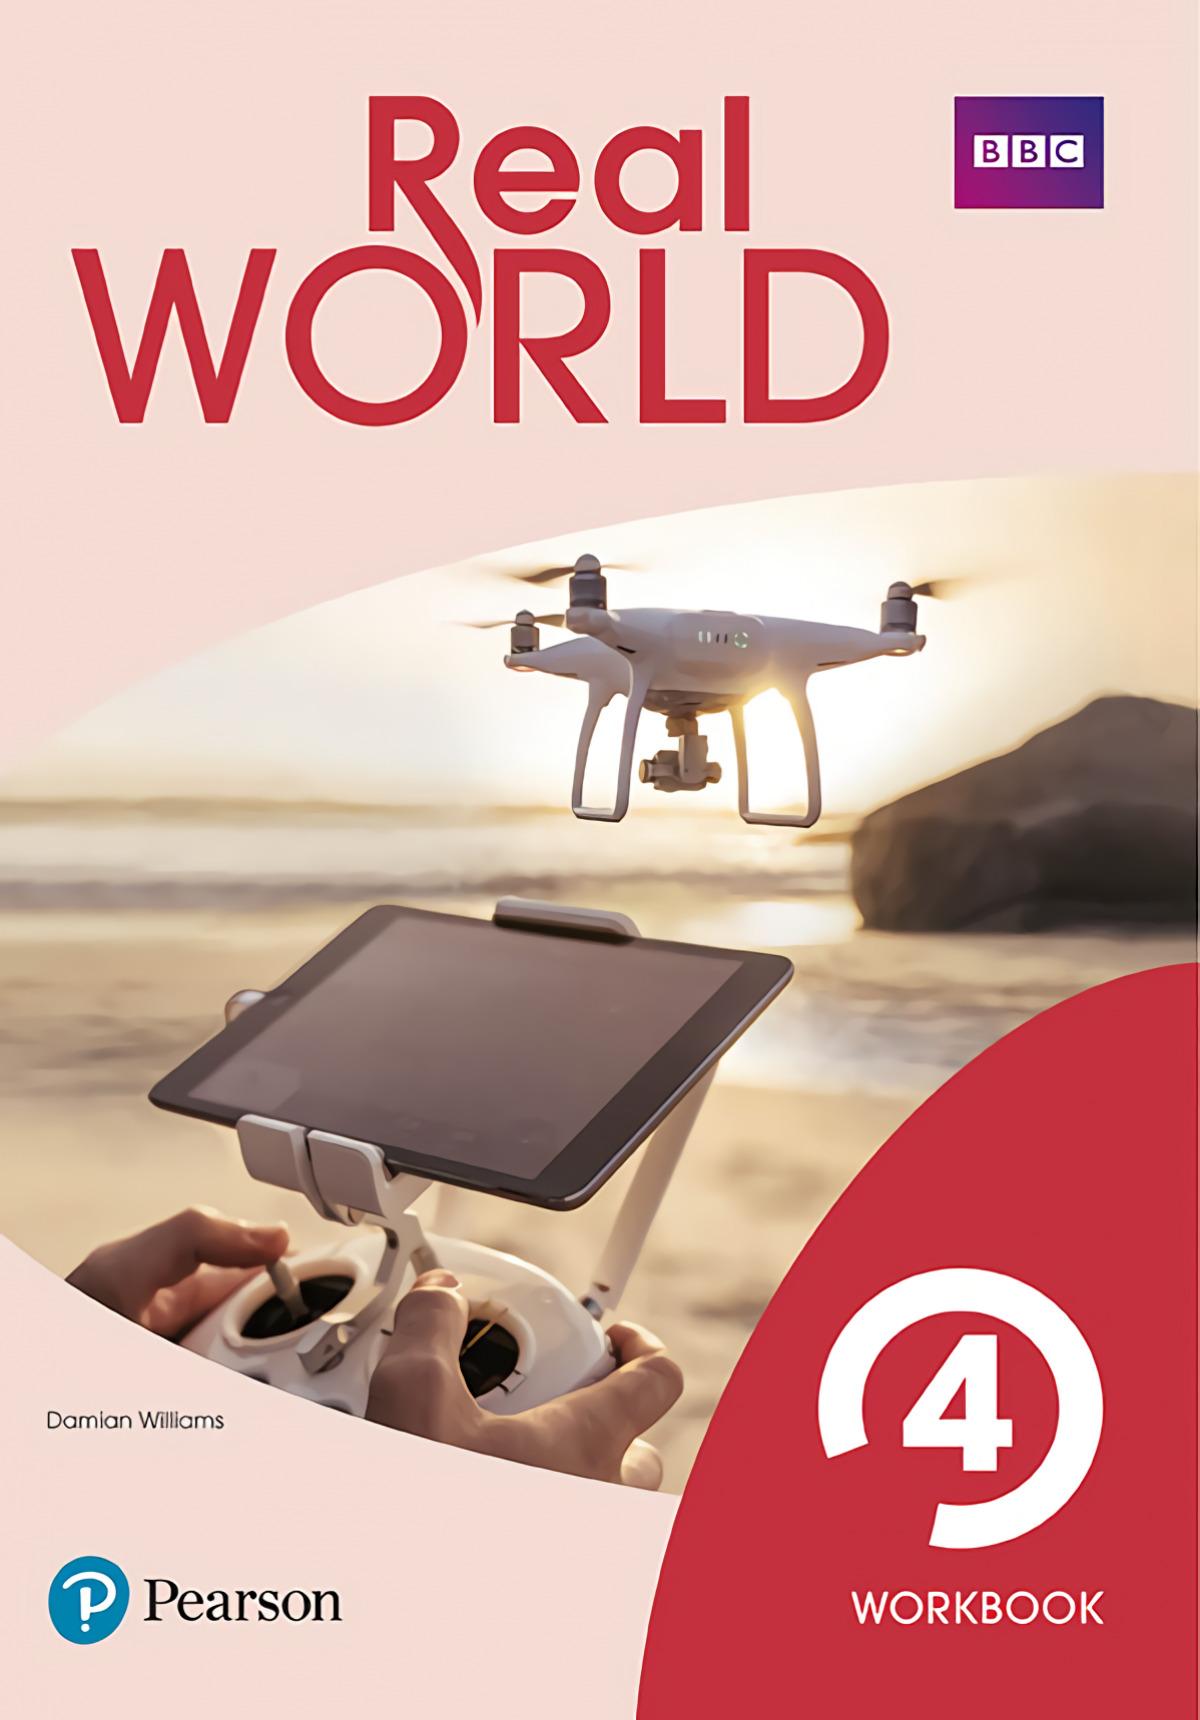 Real World 4 Workbook Print